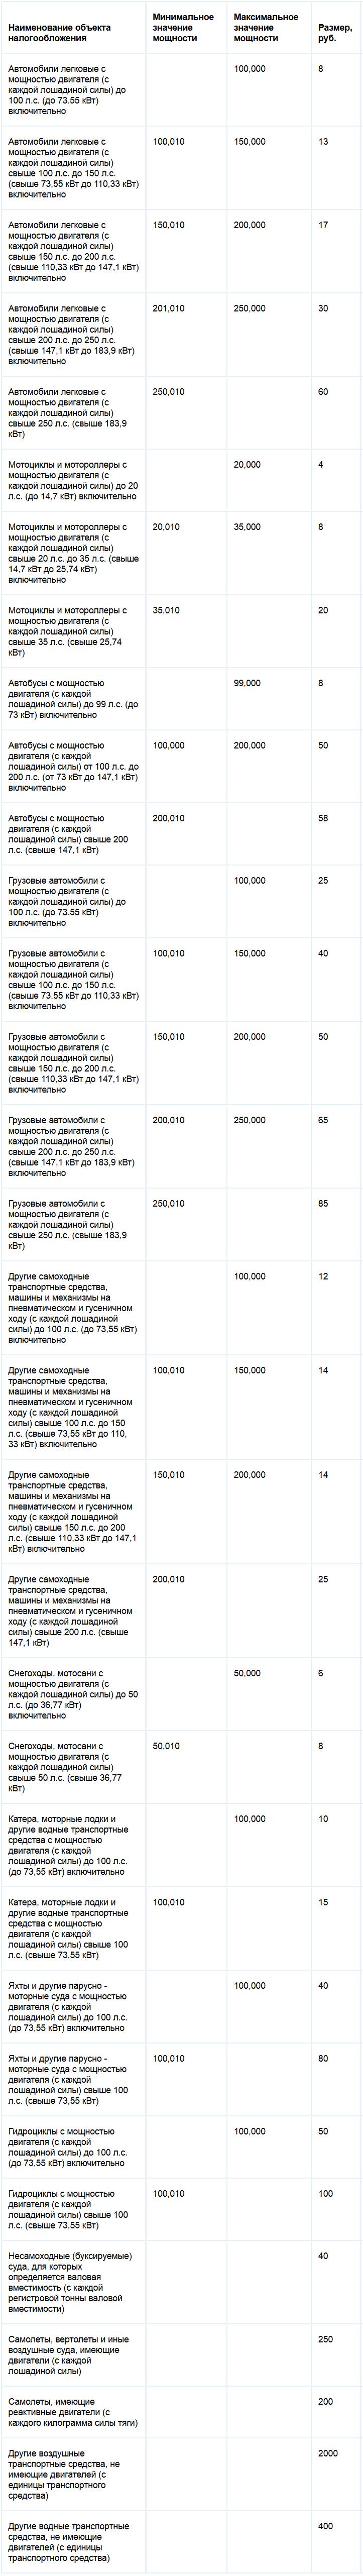 Ставки транспортного налога республики Саха (Якутия)